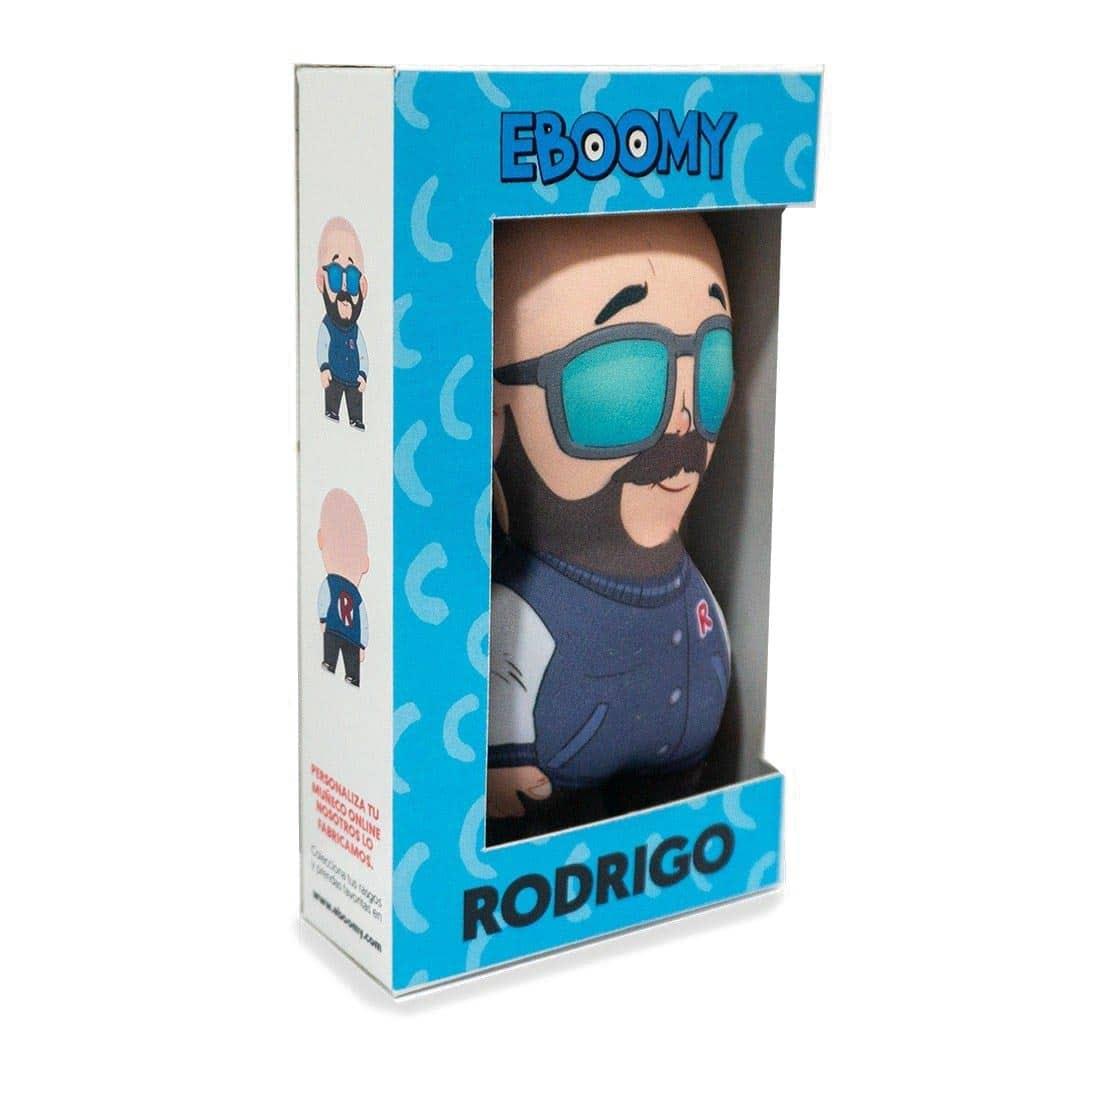 Rodri2